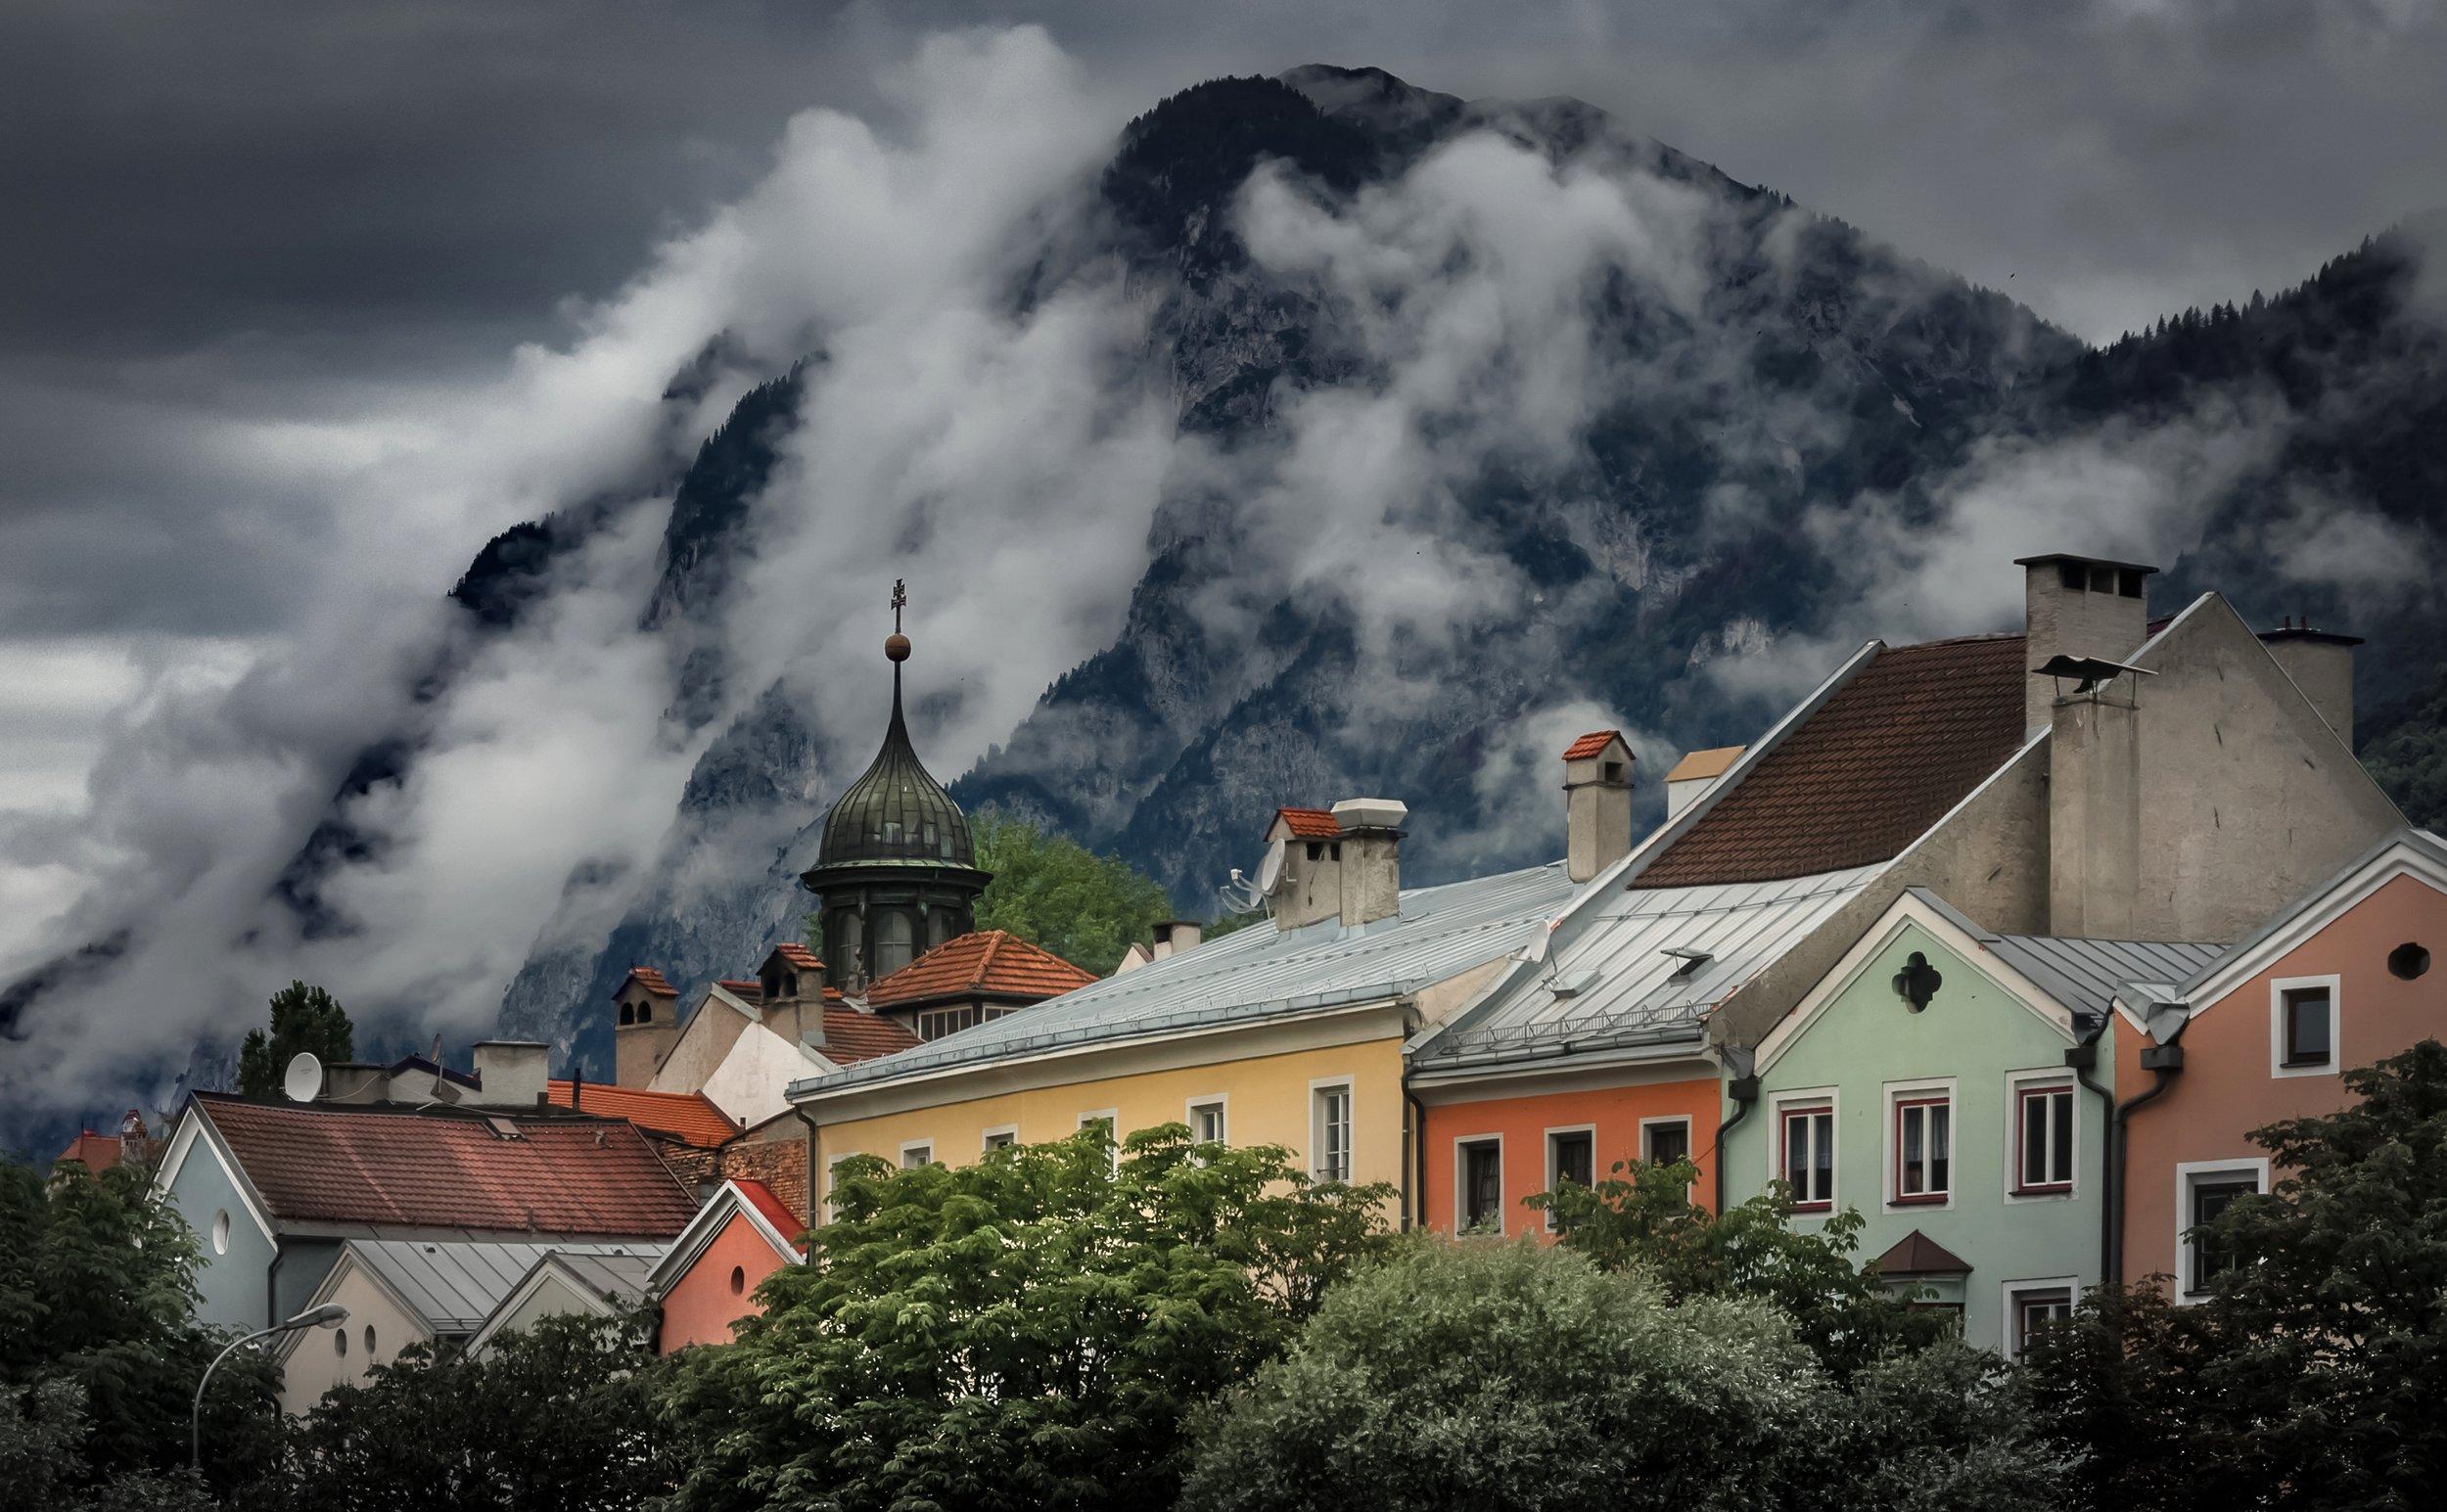 outdoor-mountain-snow-cloud-architecture-sky-house-mountain-range-weather-austria-clouds-houses-tirol-sterreich-innsbruck-rural-area-239699.jpg